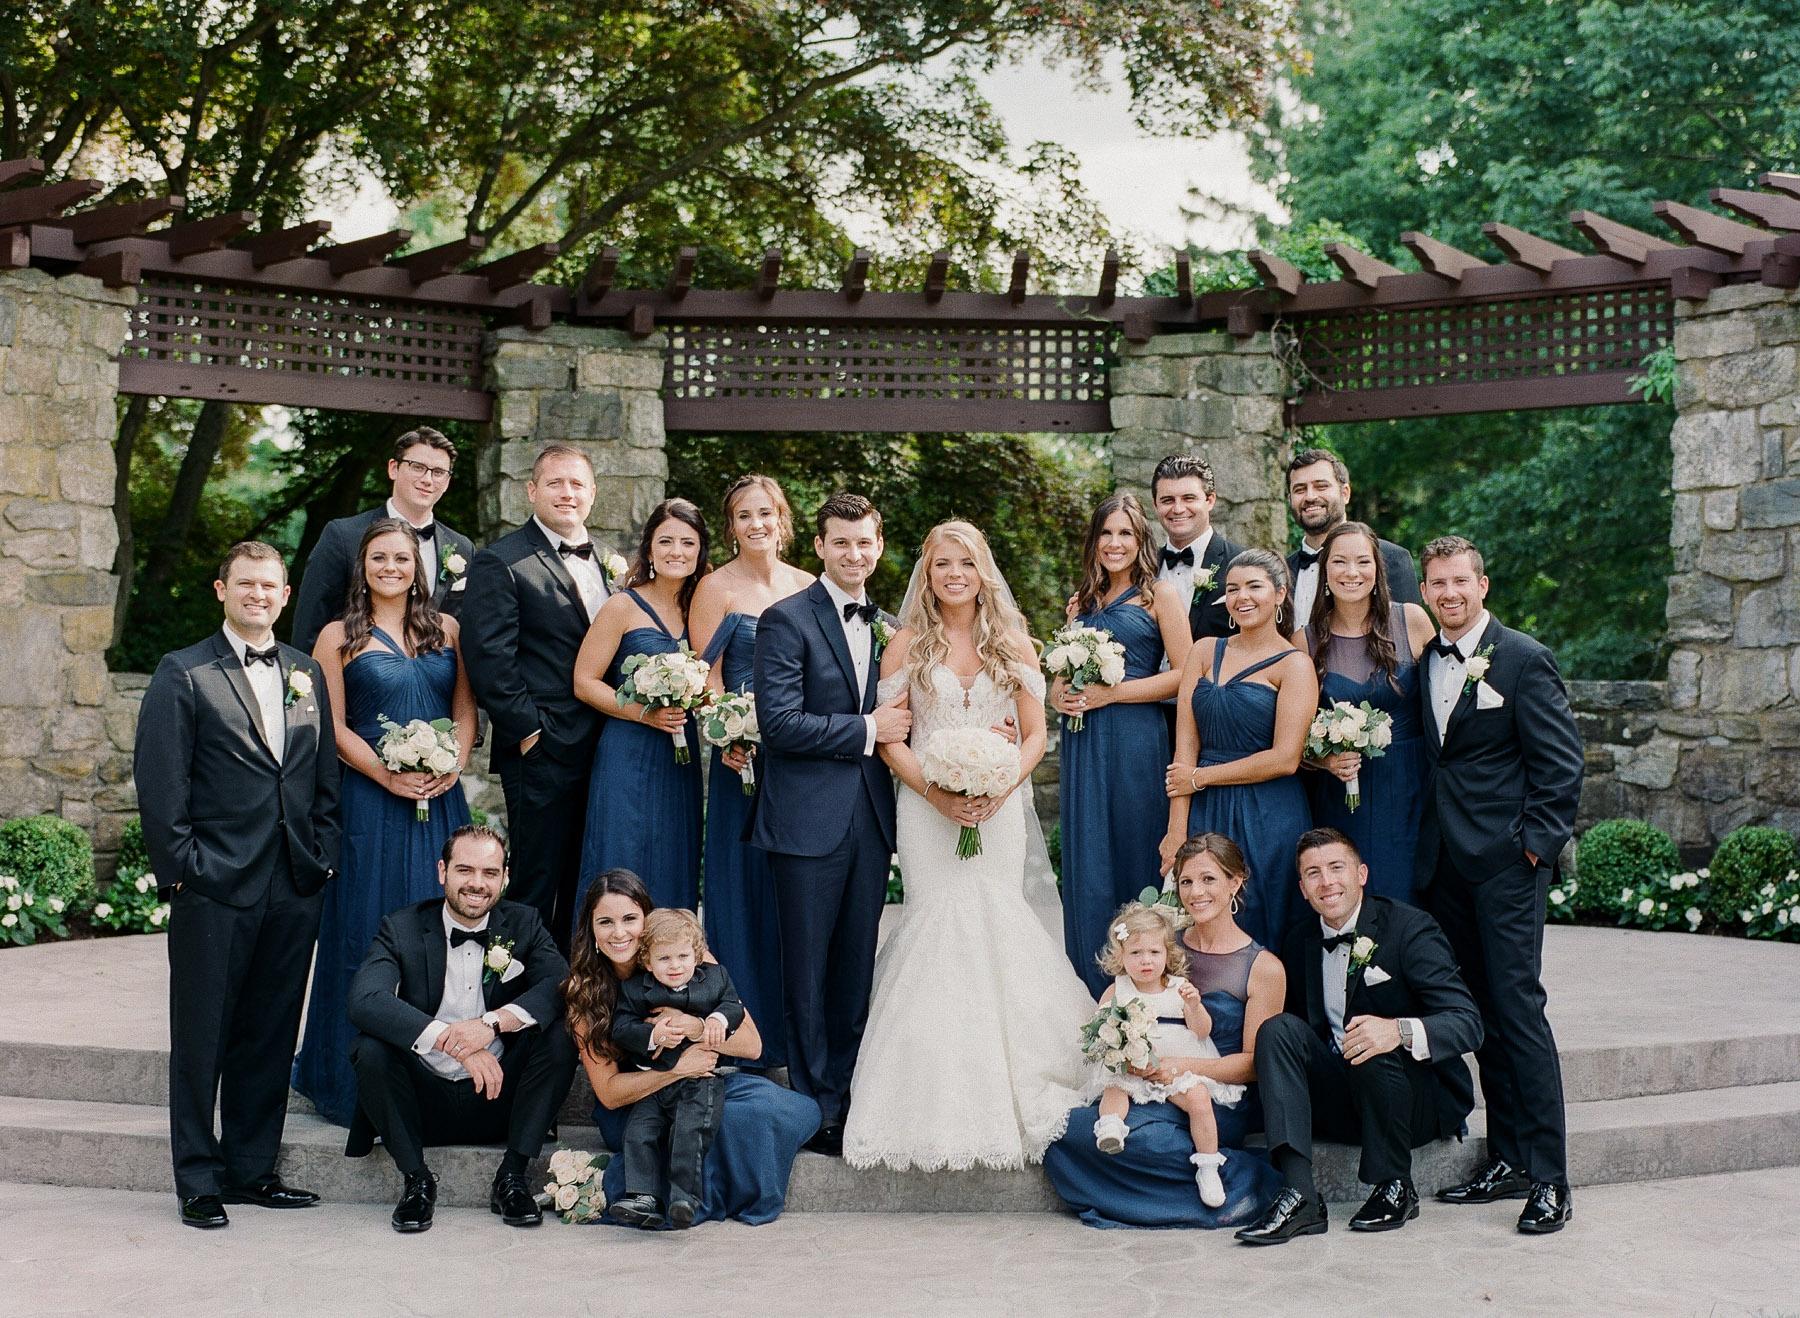 Le Chateau Bridal Party Photo